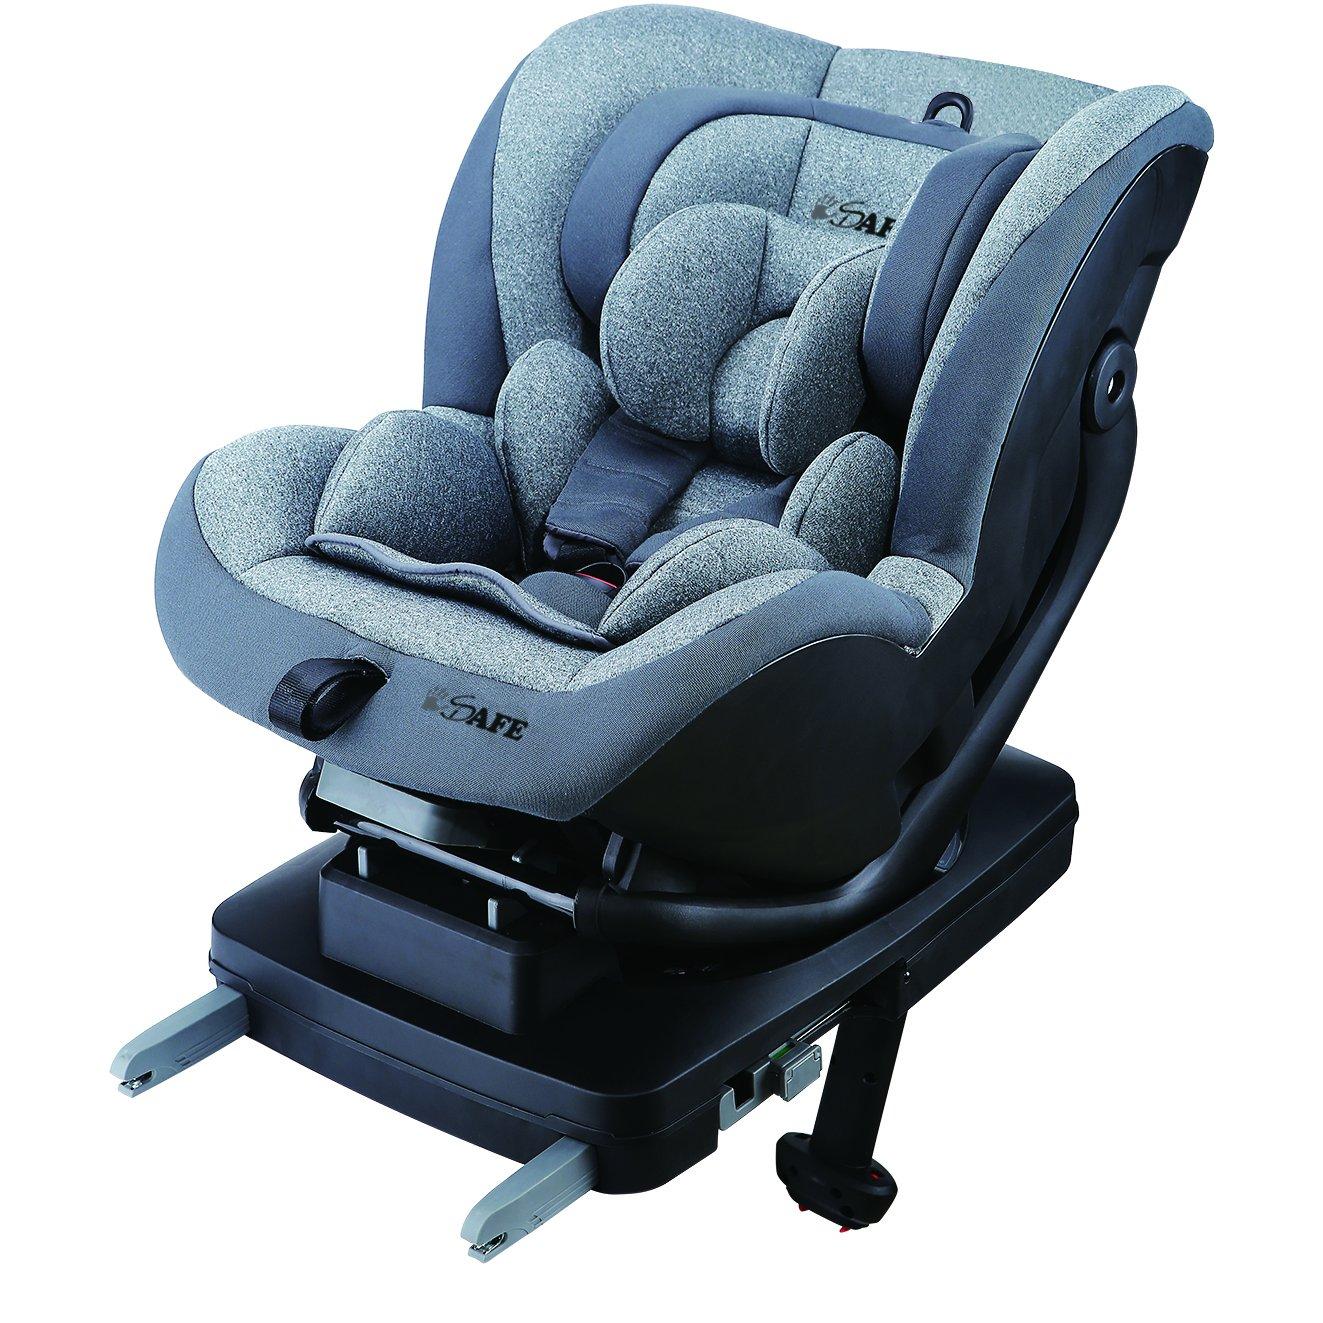 Aurora iSOFIX Carseat Group 0+1 Car Seat - Various Designs (Dark Knight (Black/Grey)) Baby Travel